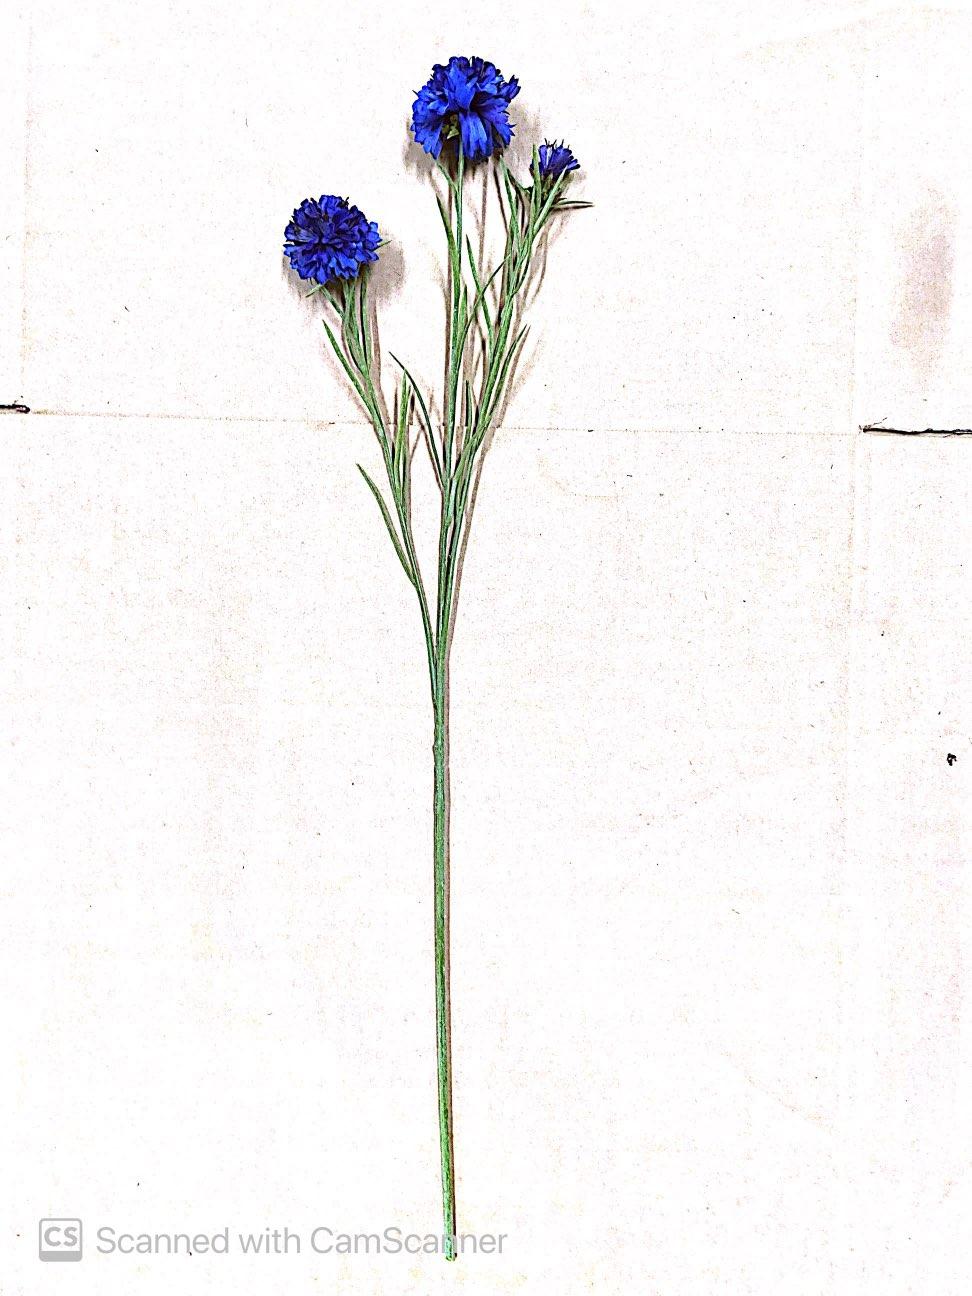 Blue Flowers on Stem Artificial Image